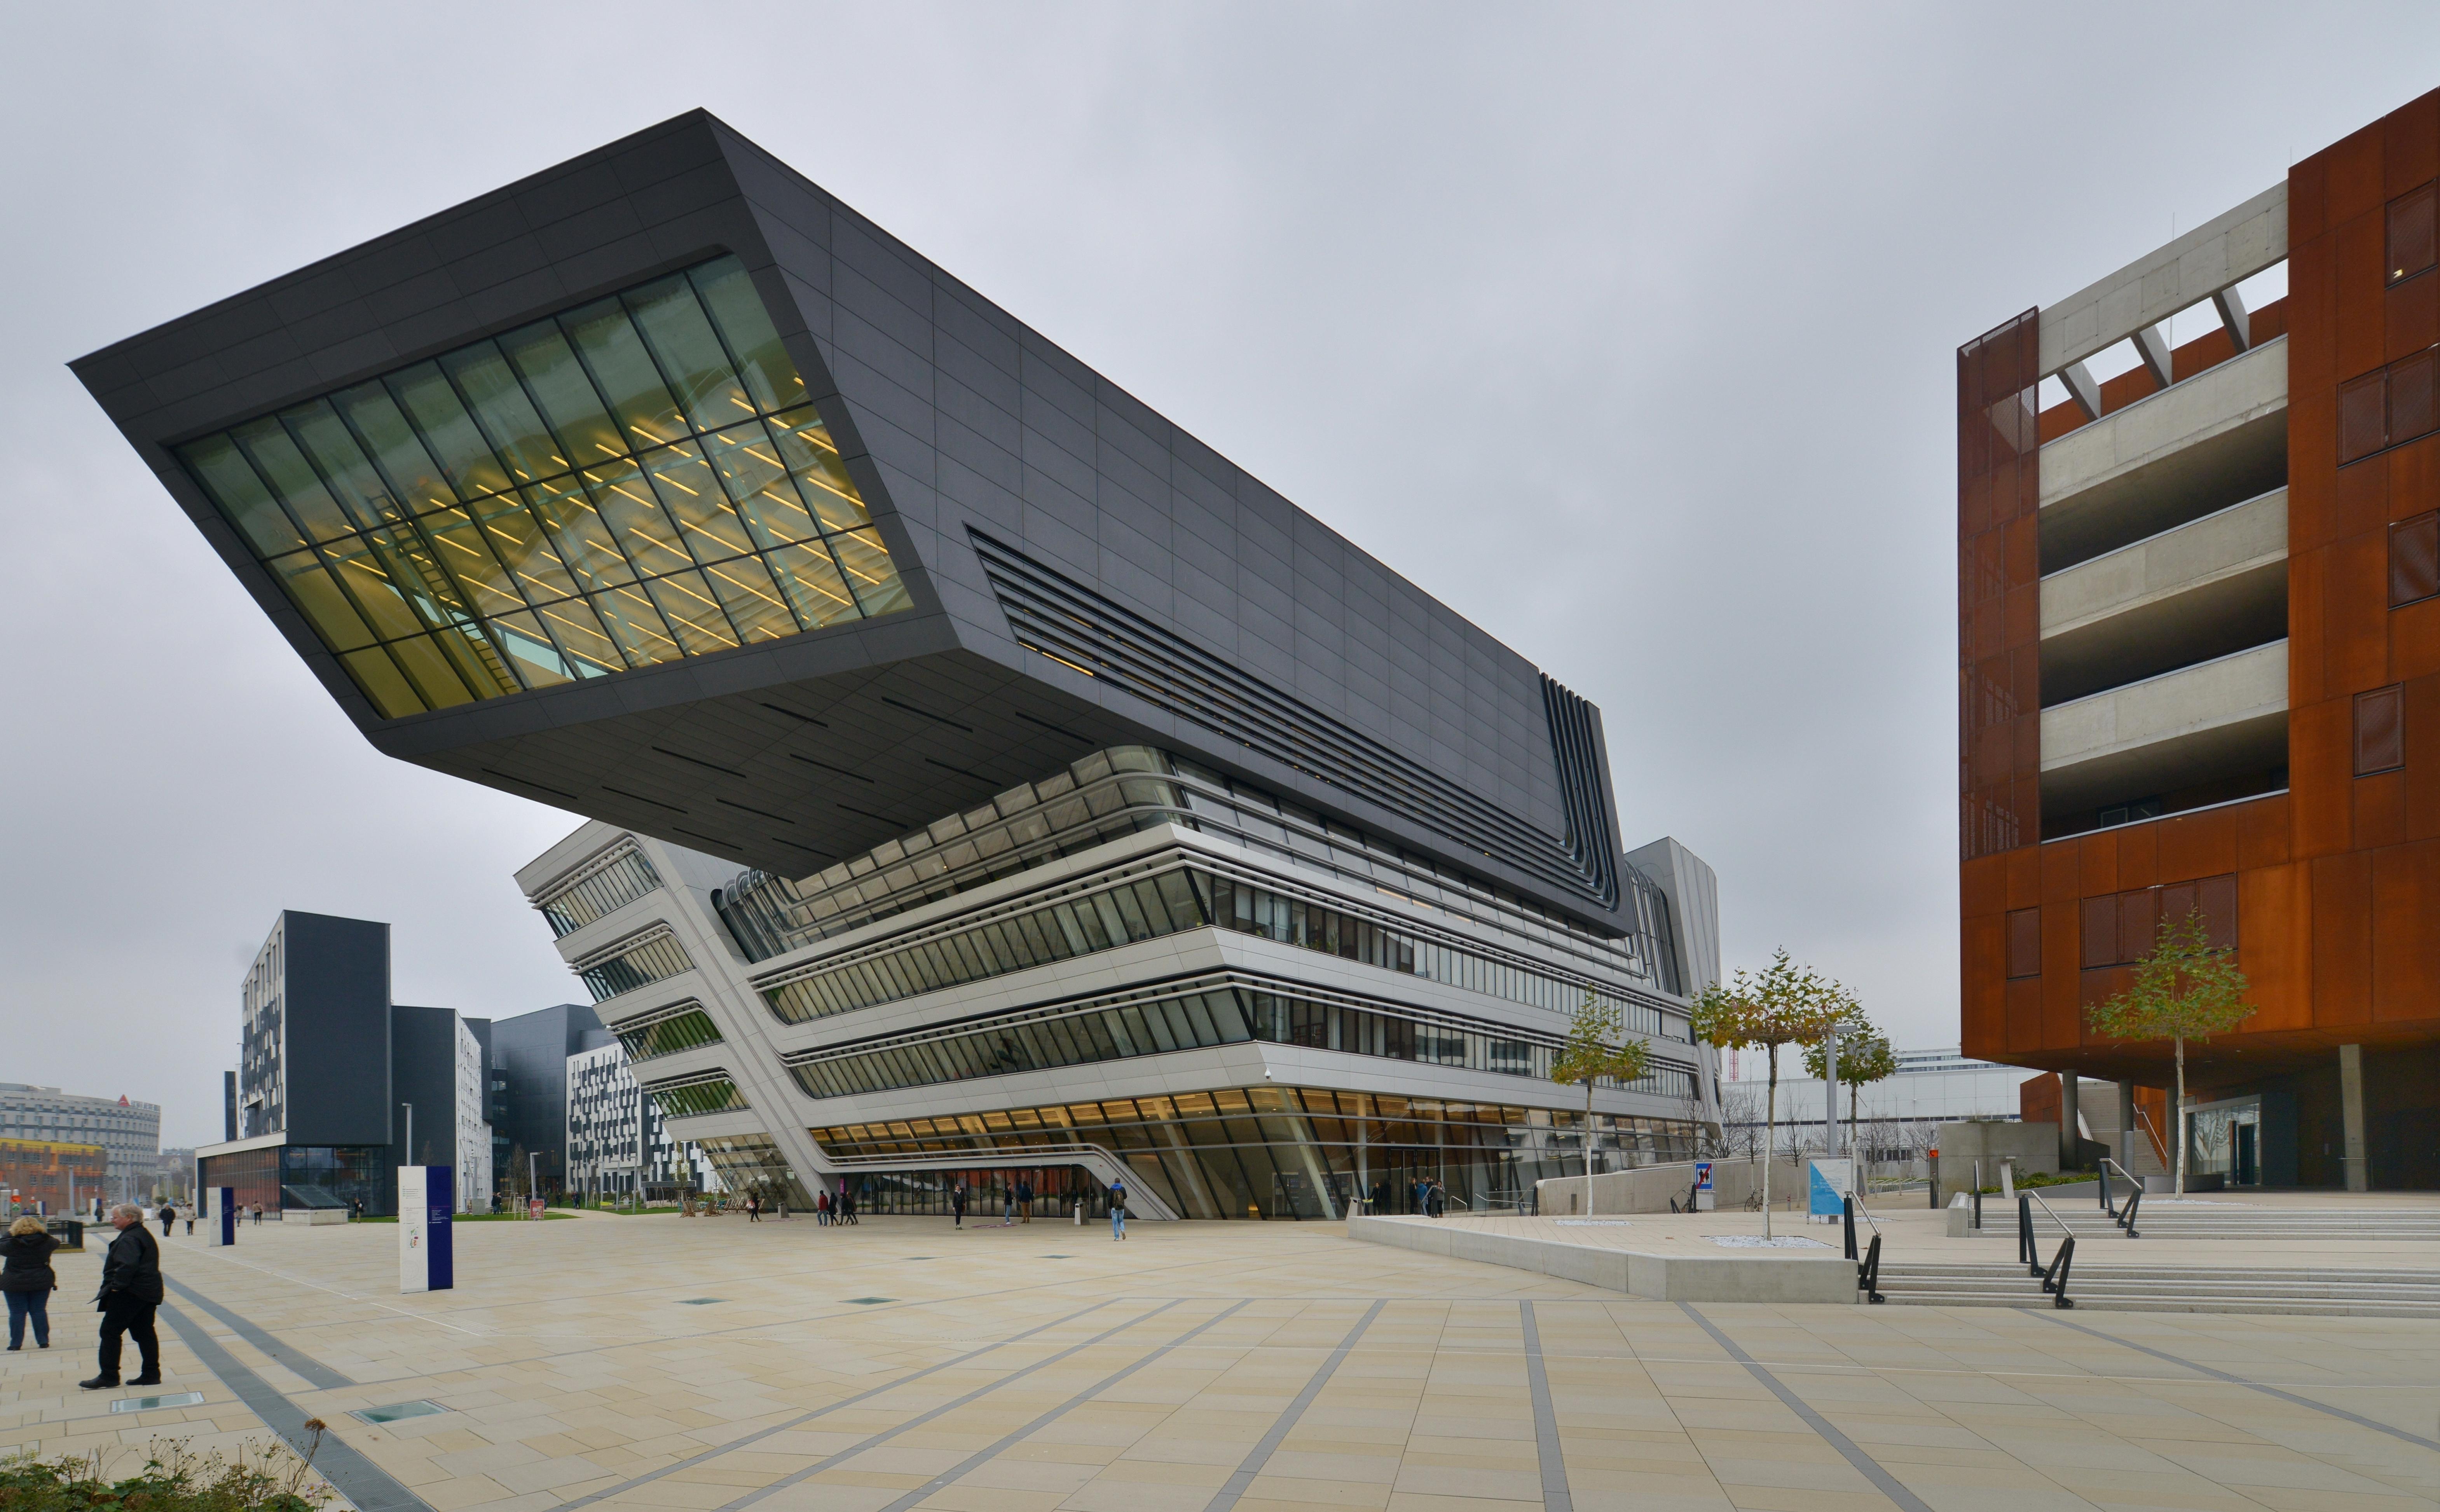 filewu wien library learning center zaha hadid 009 - Modern Architecture Vienna